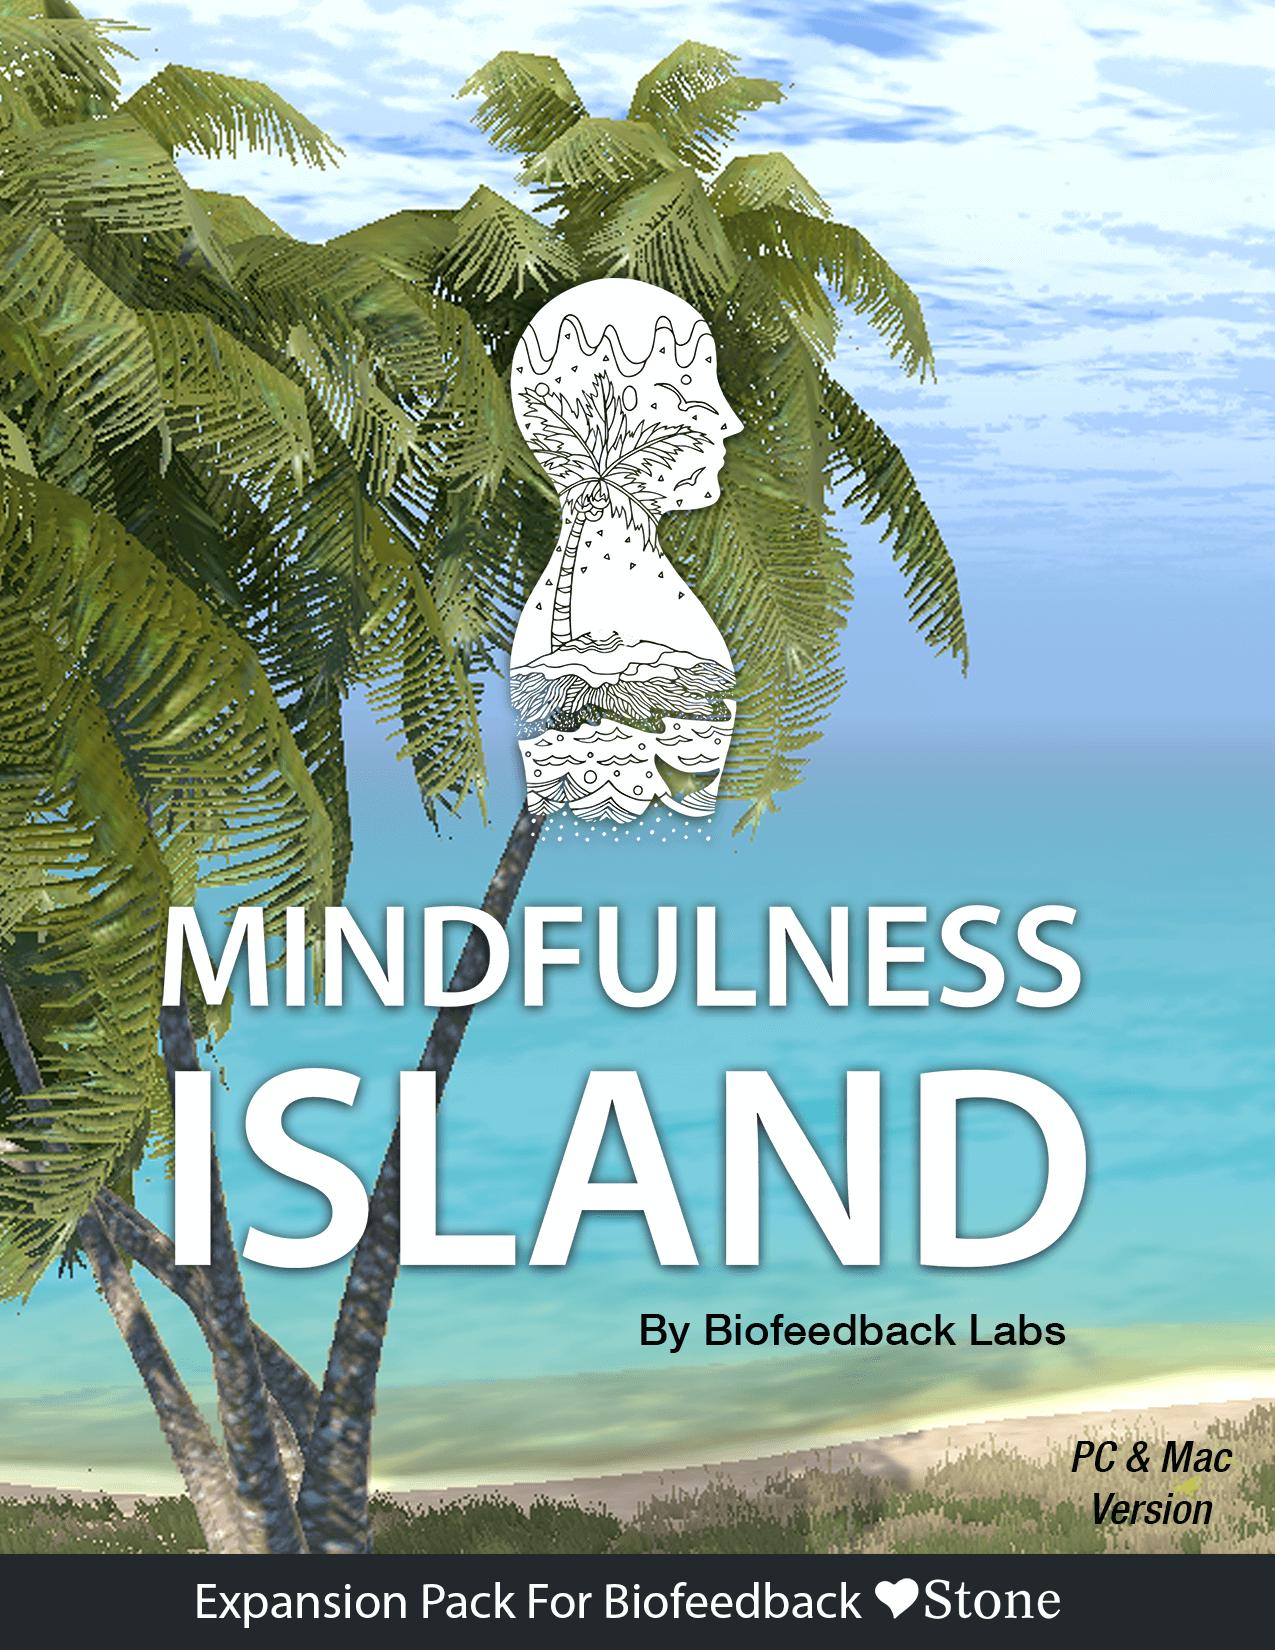 Mindfulness Island - Biofeedback Games